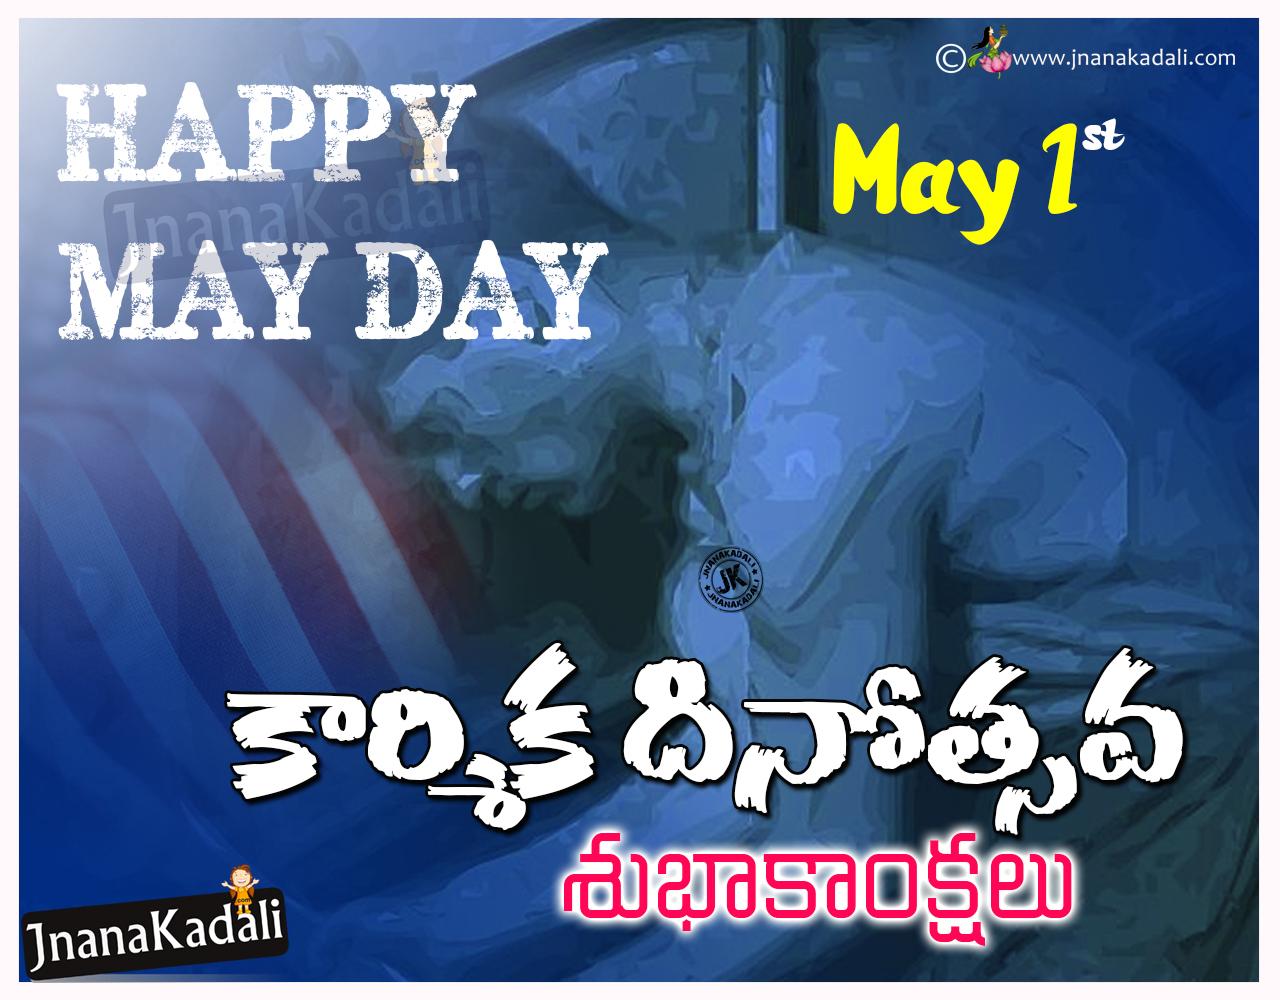 May Day Subhakankshalu Images May Day Greetings In Telugu